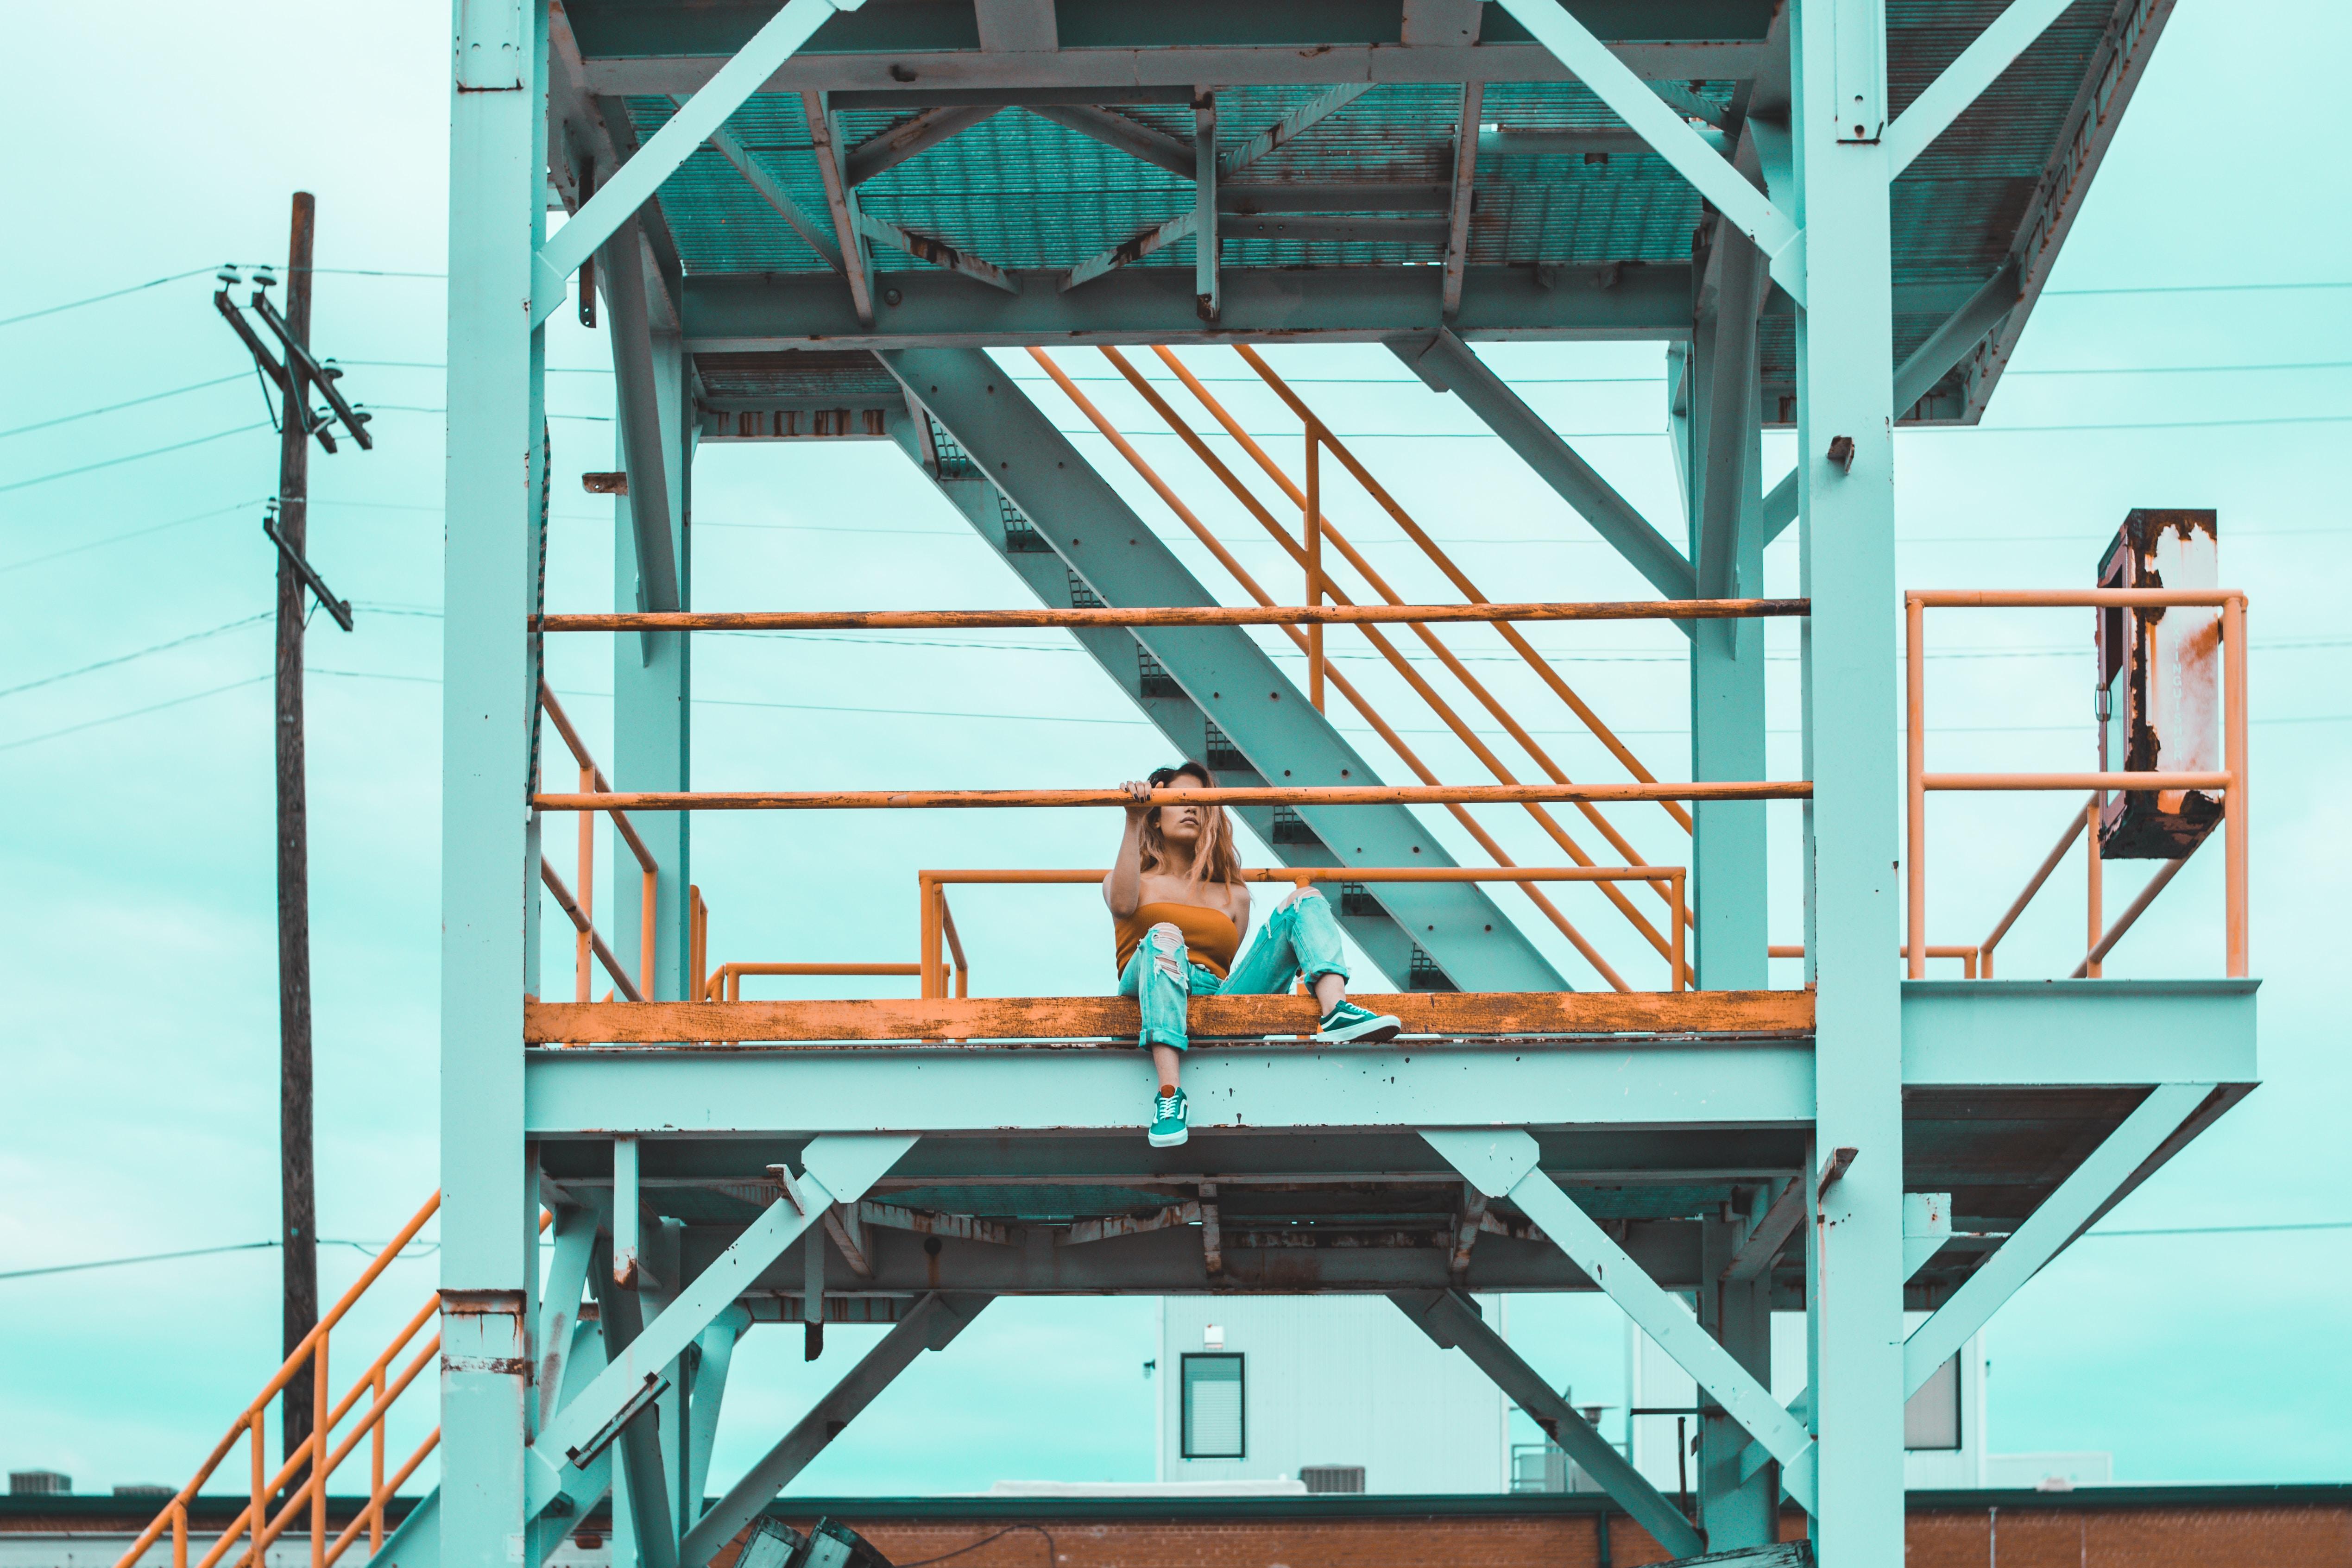 woman sitting on balcony